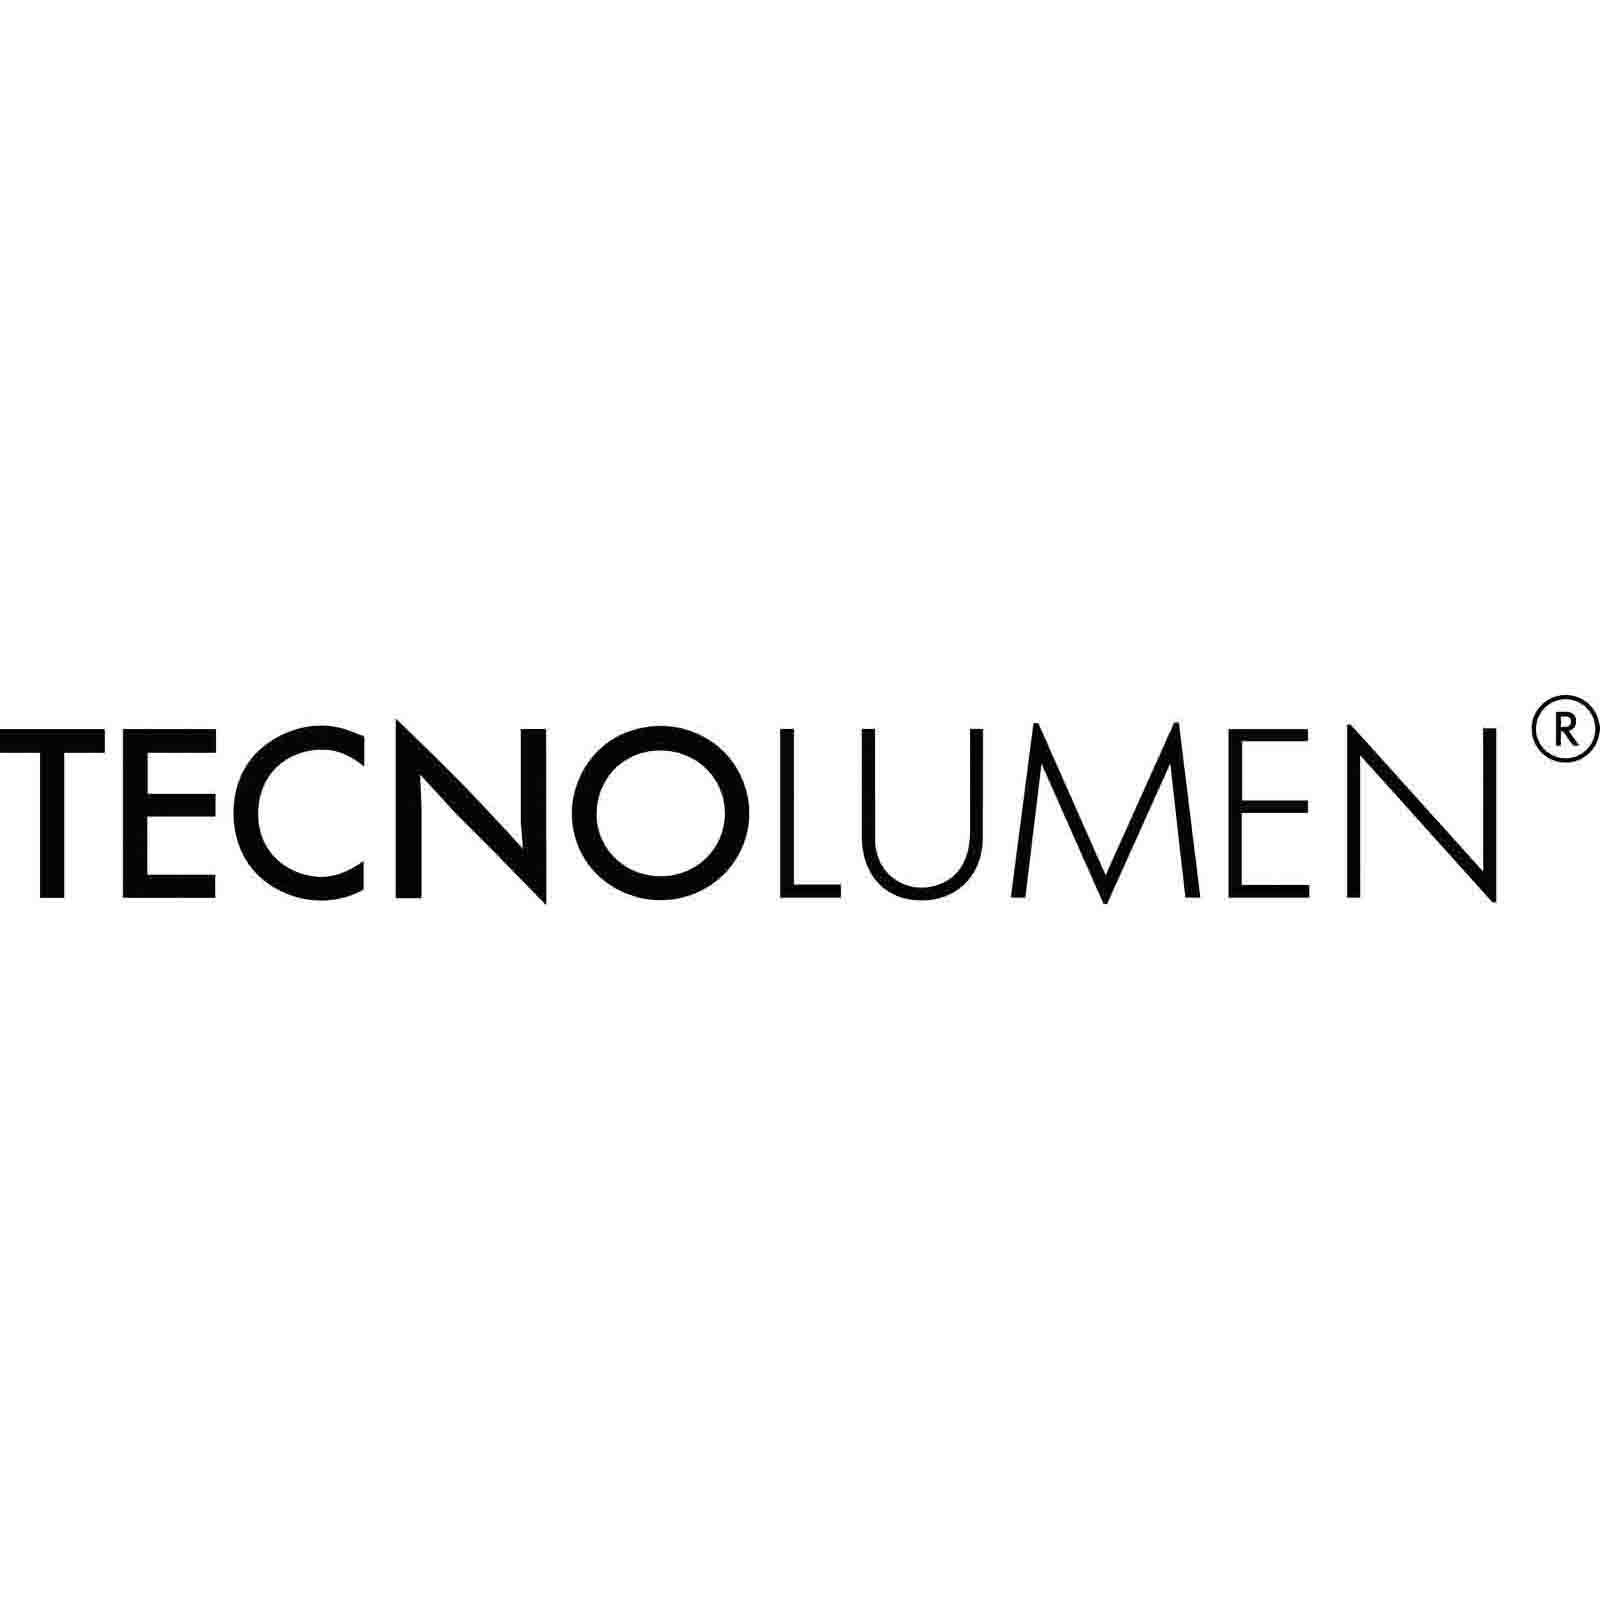 TECNOLUMEN